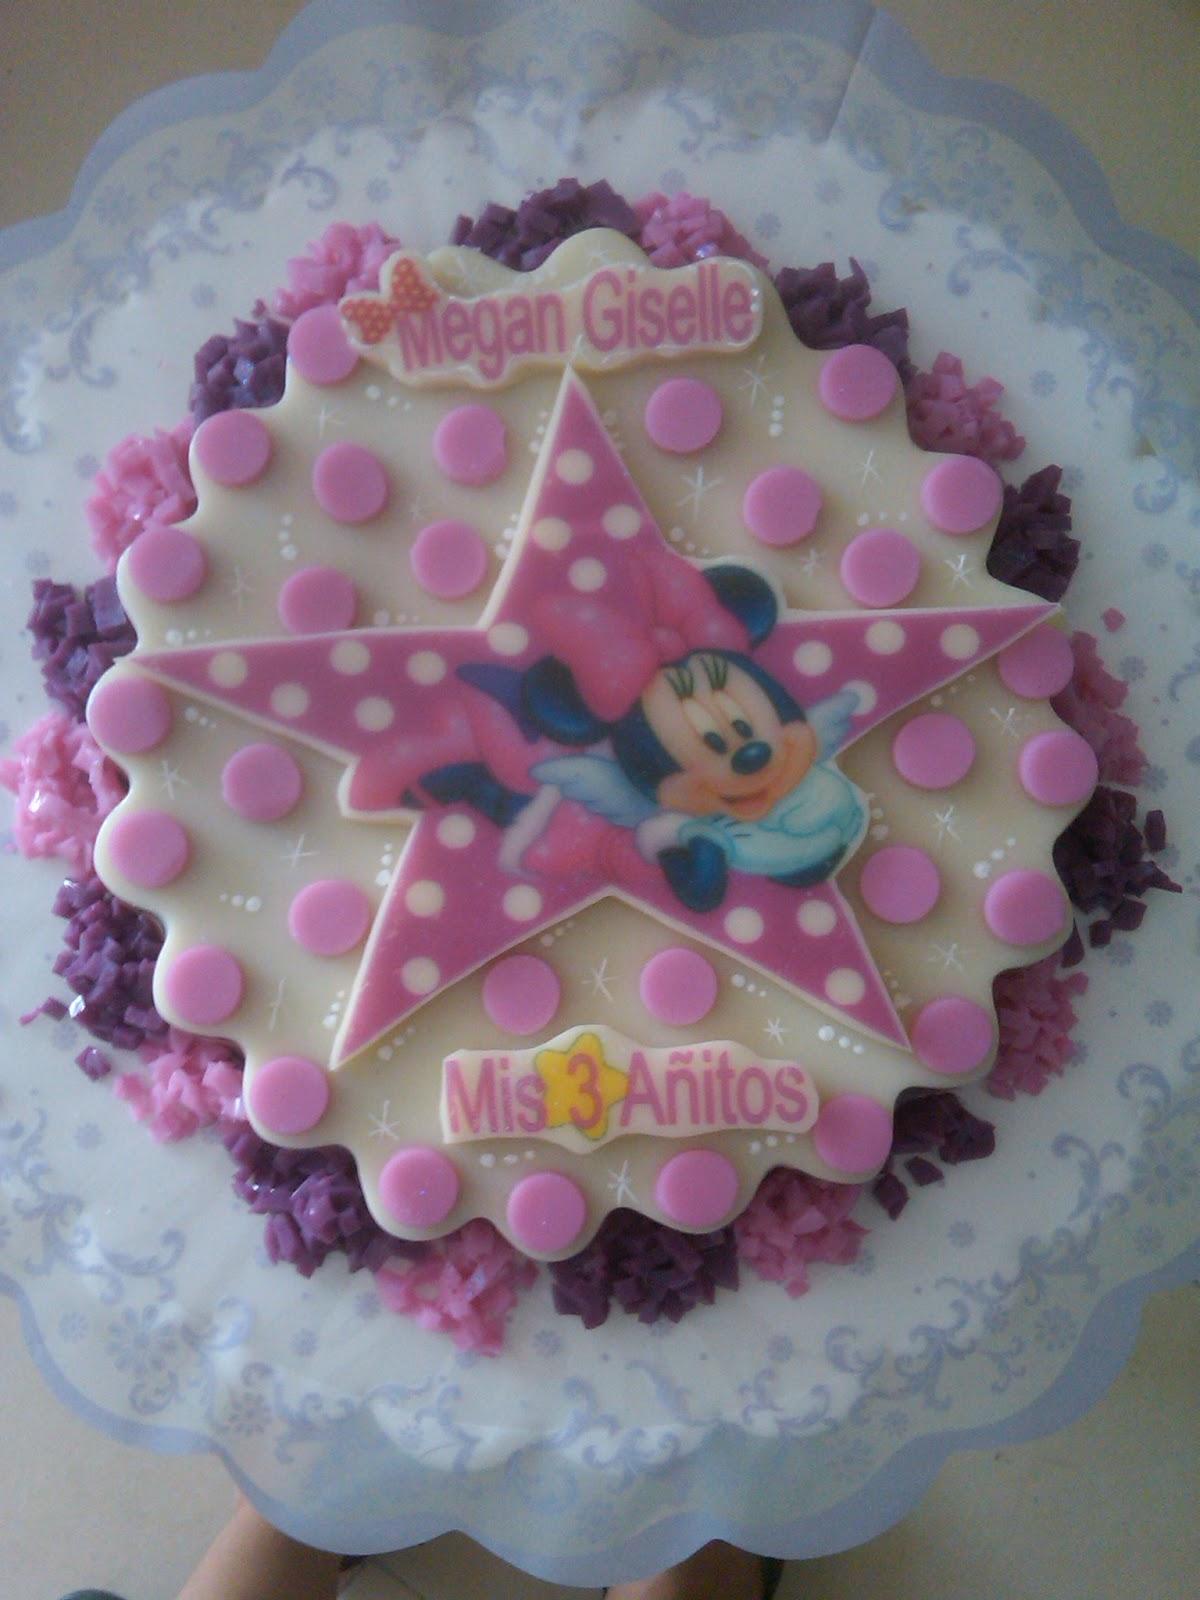 Azucake´s: Torta y Gelatina de Minnie Mouse